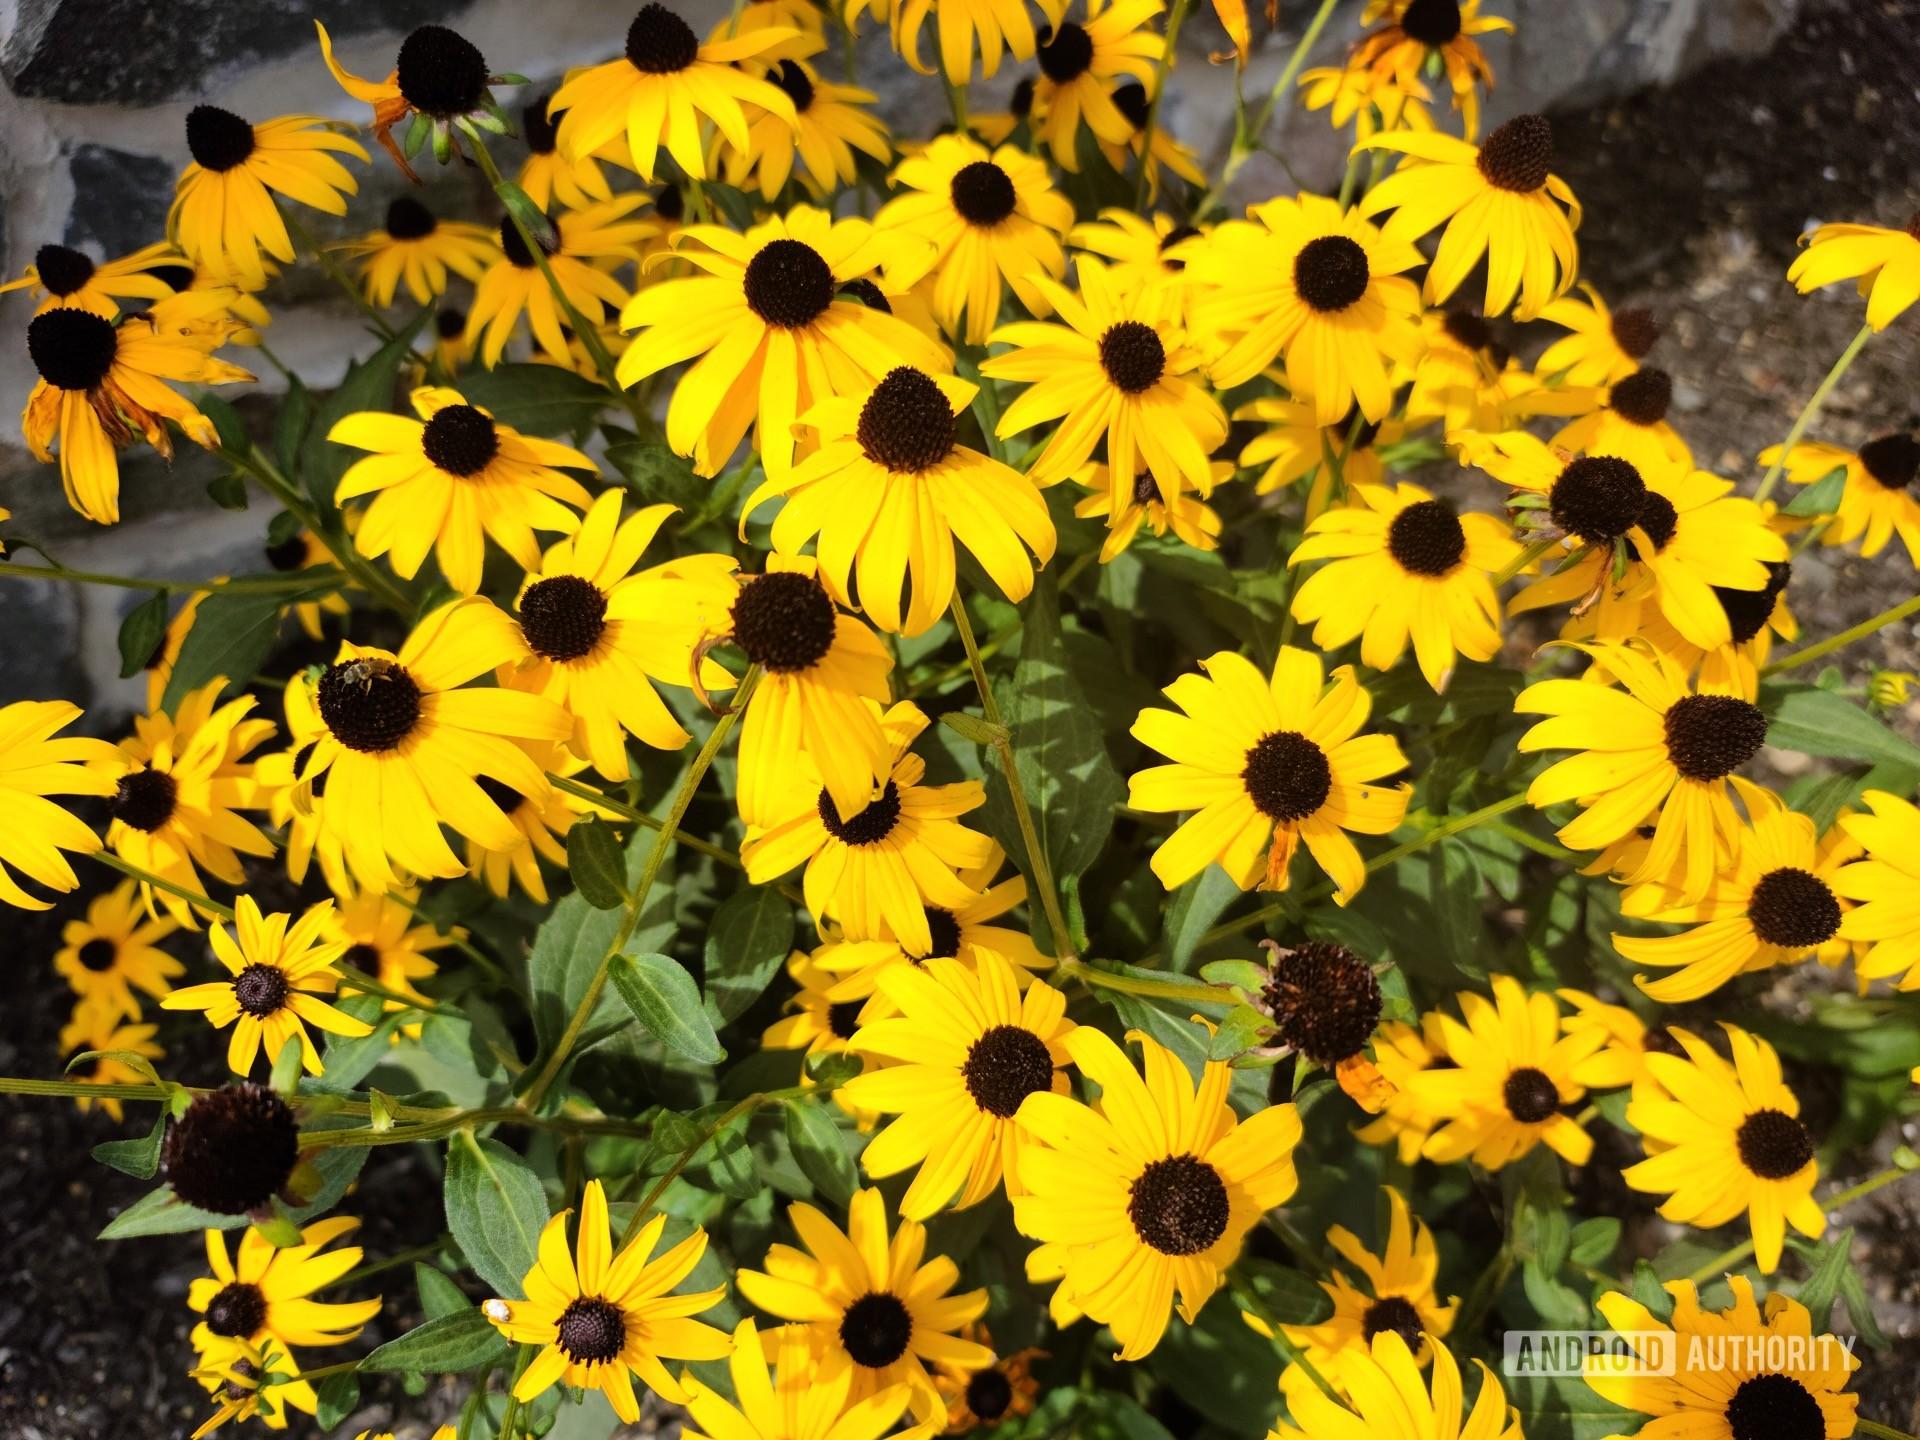 Samsung Galaxy S20 Ultra photo sample flowers